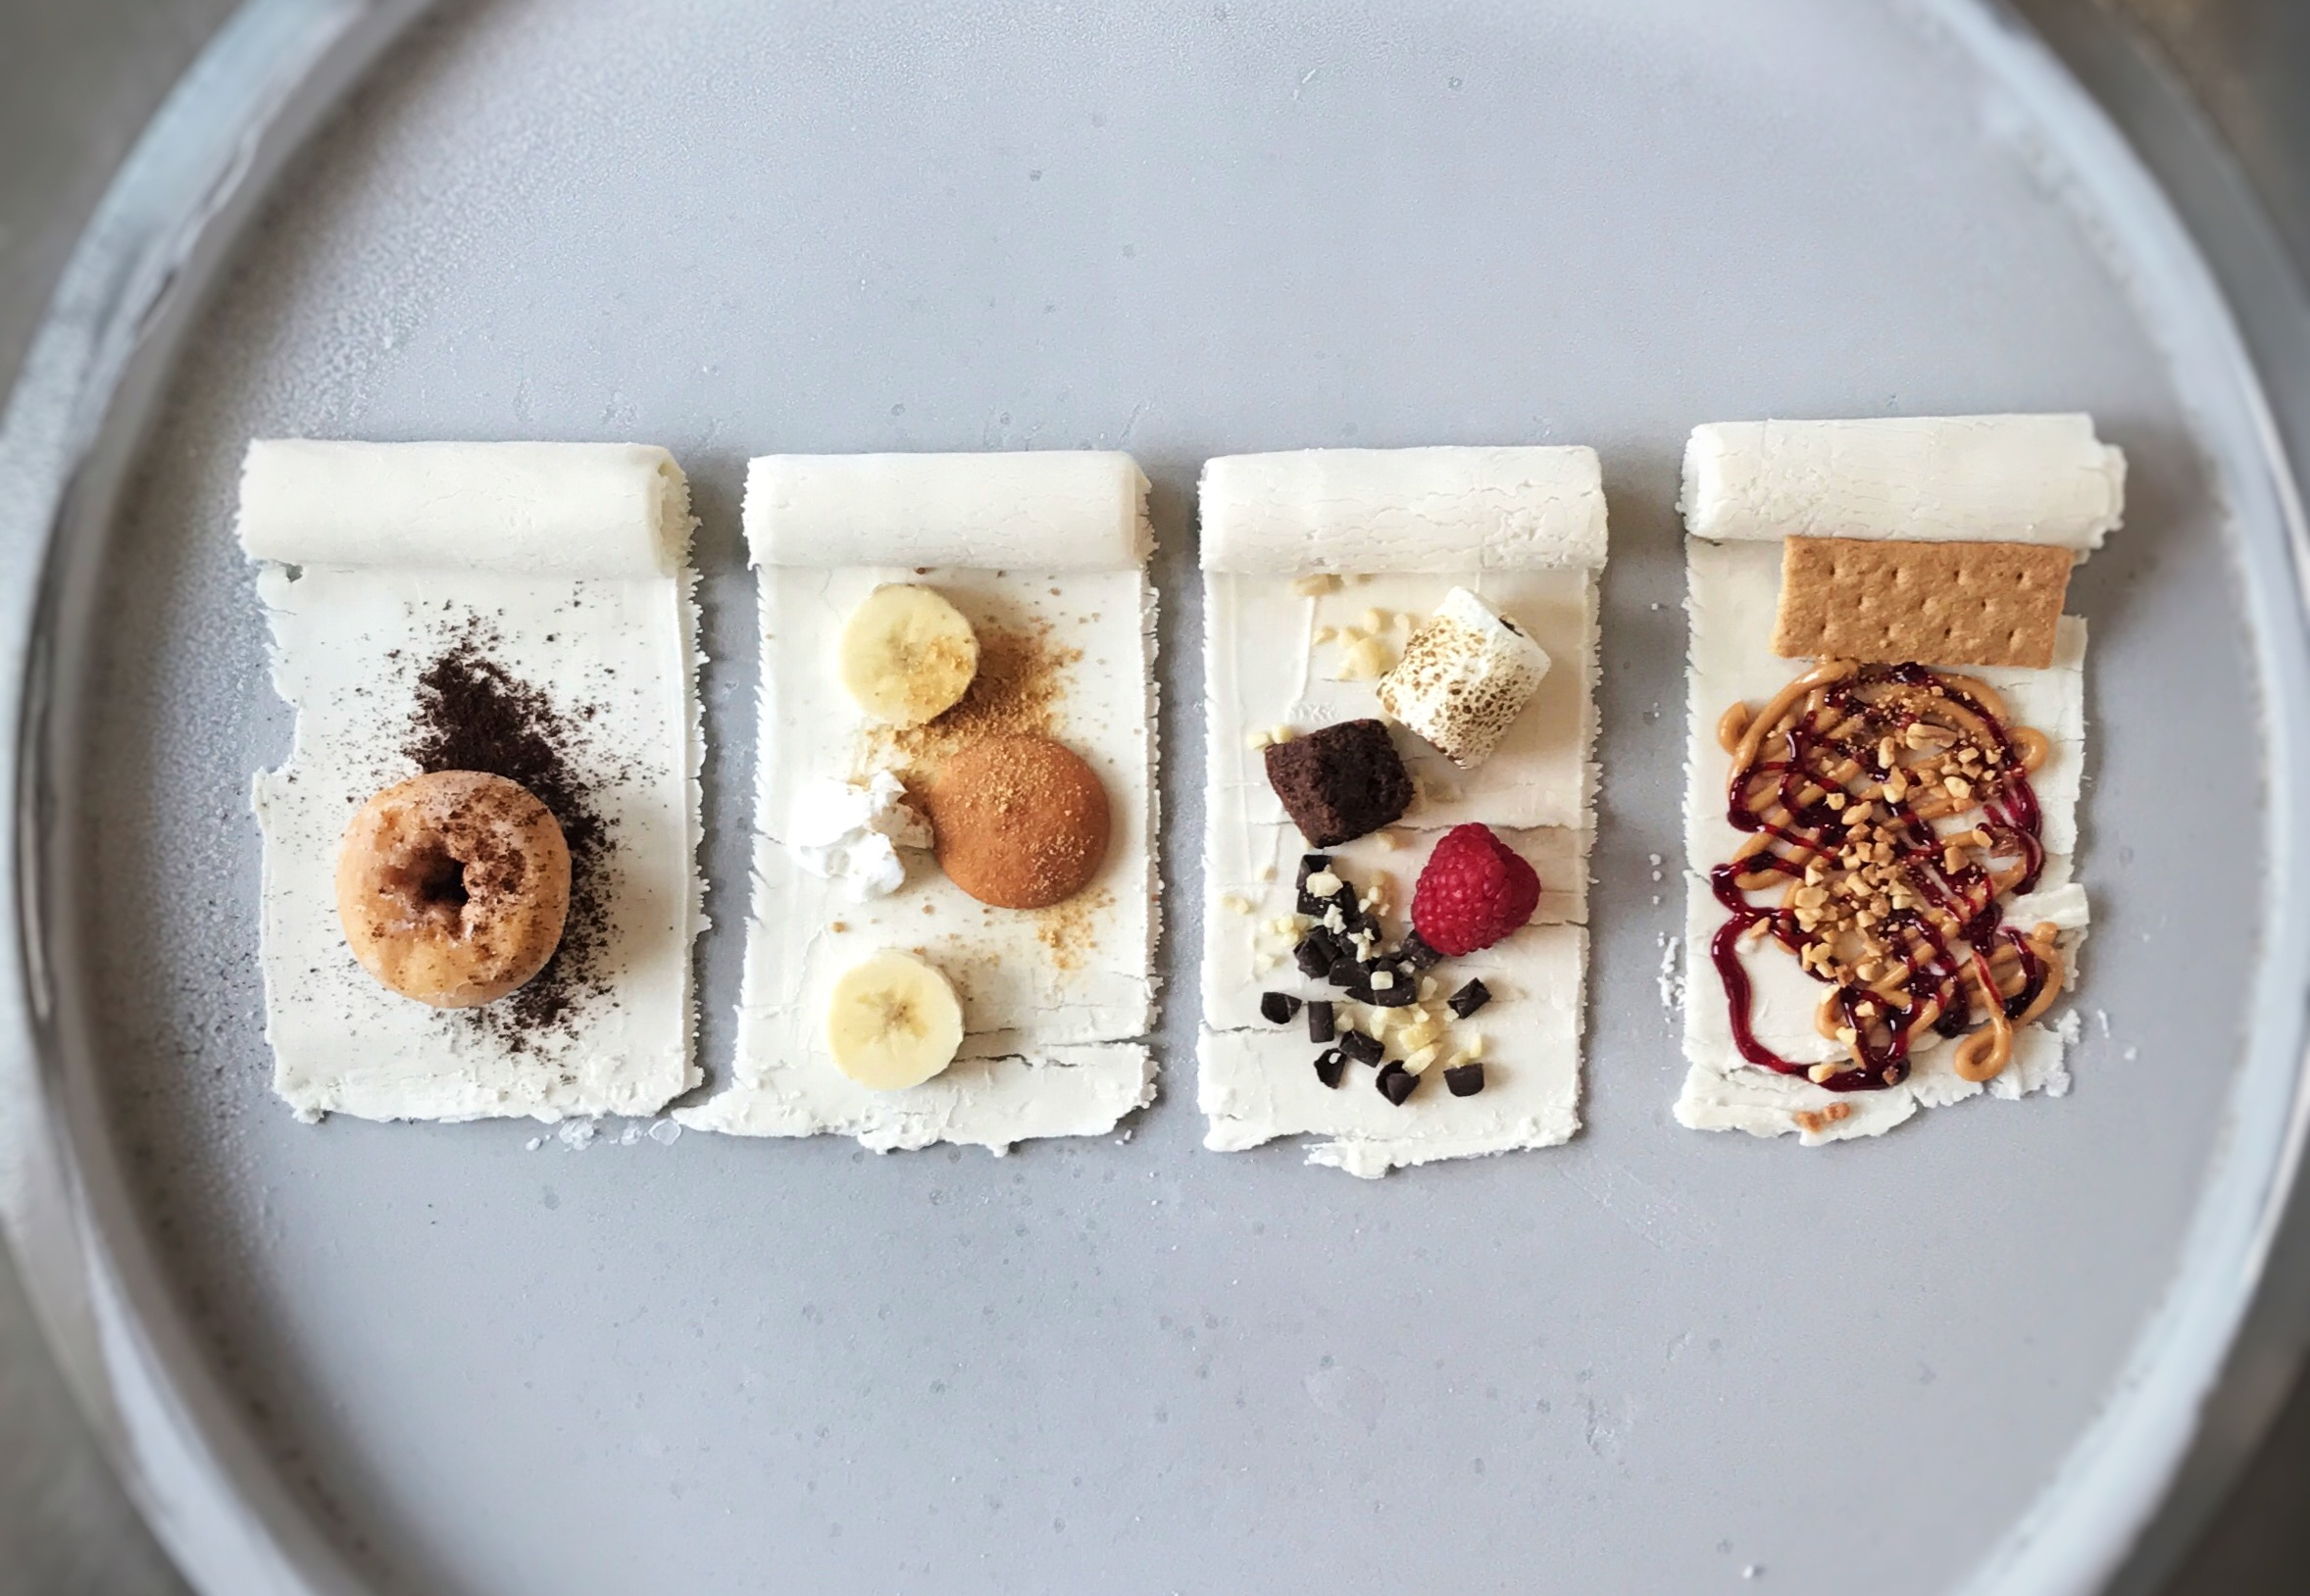 NatuRoll Creamery